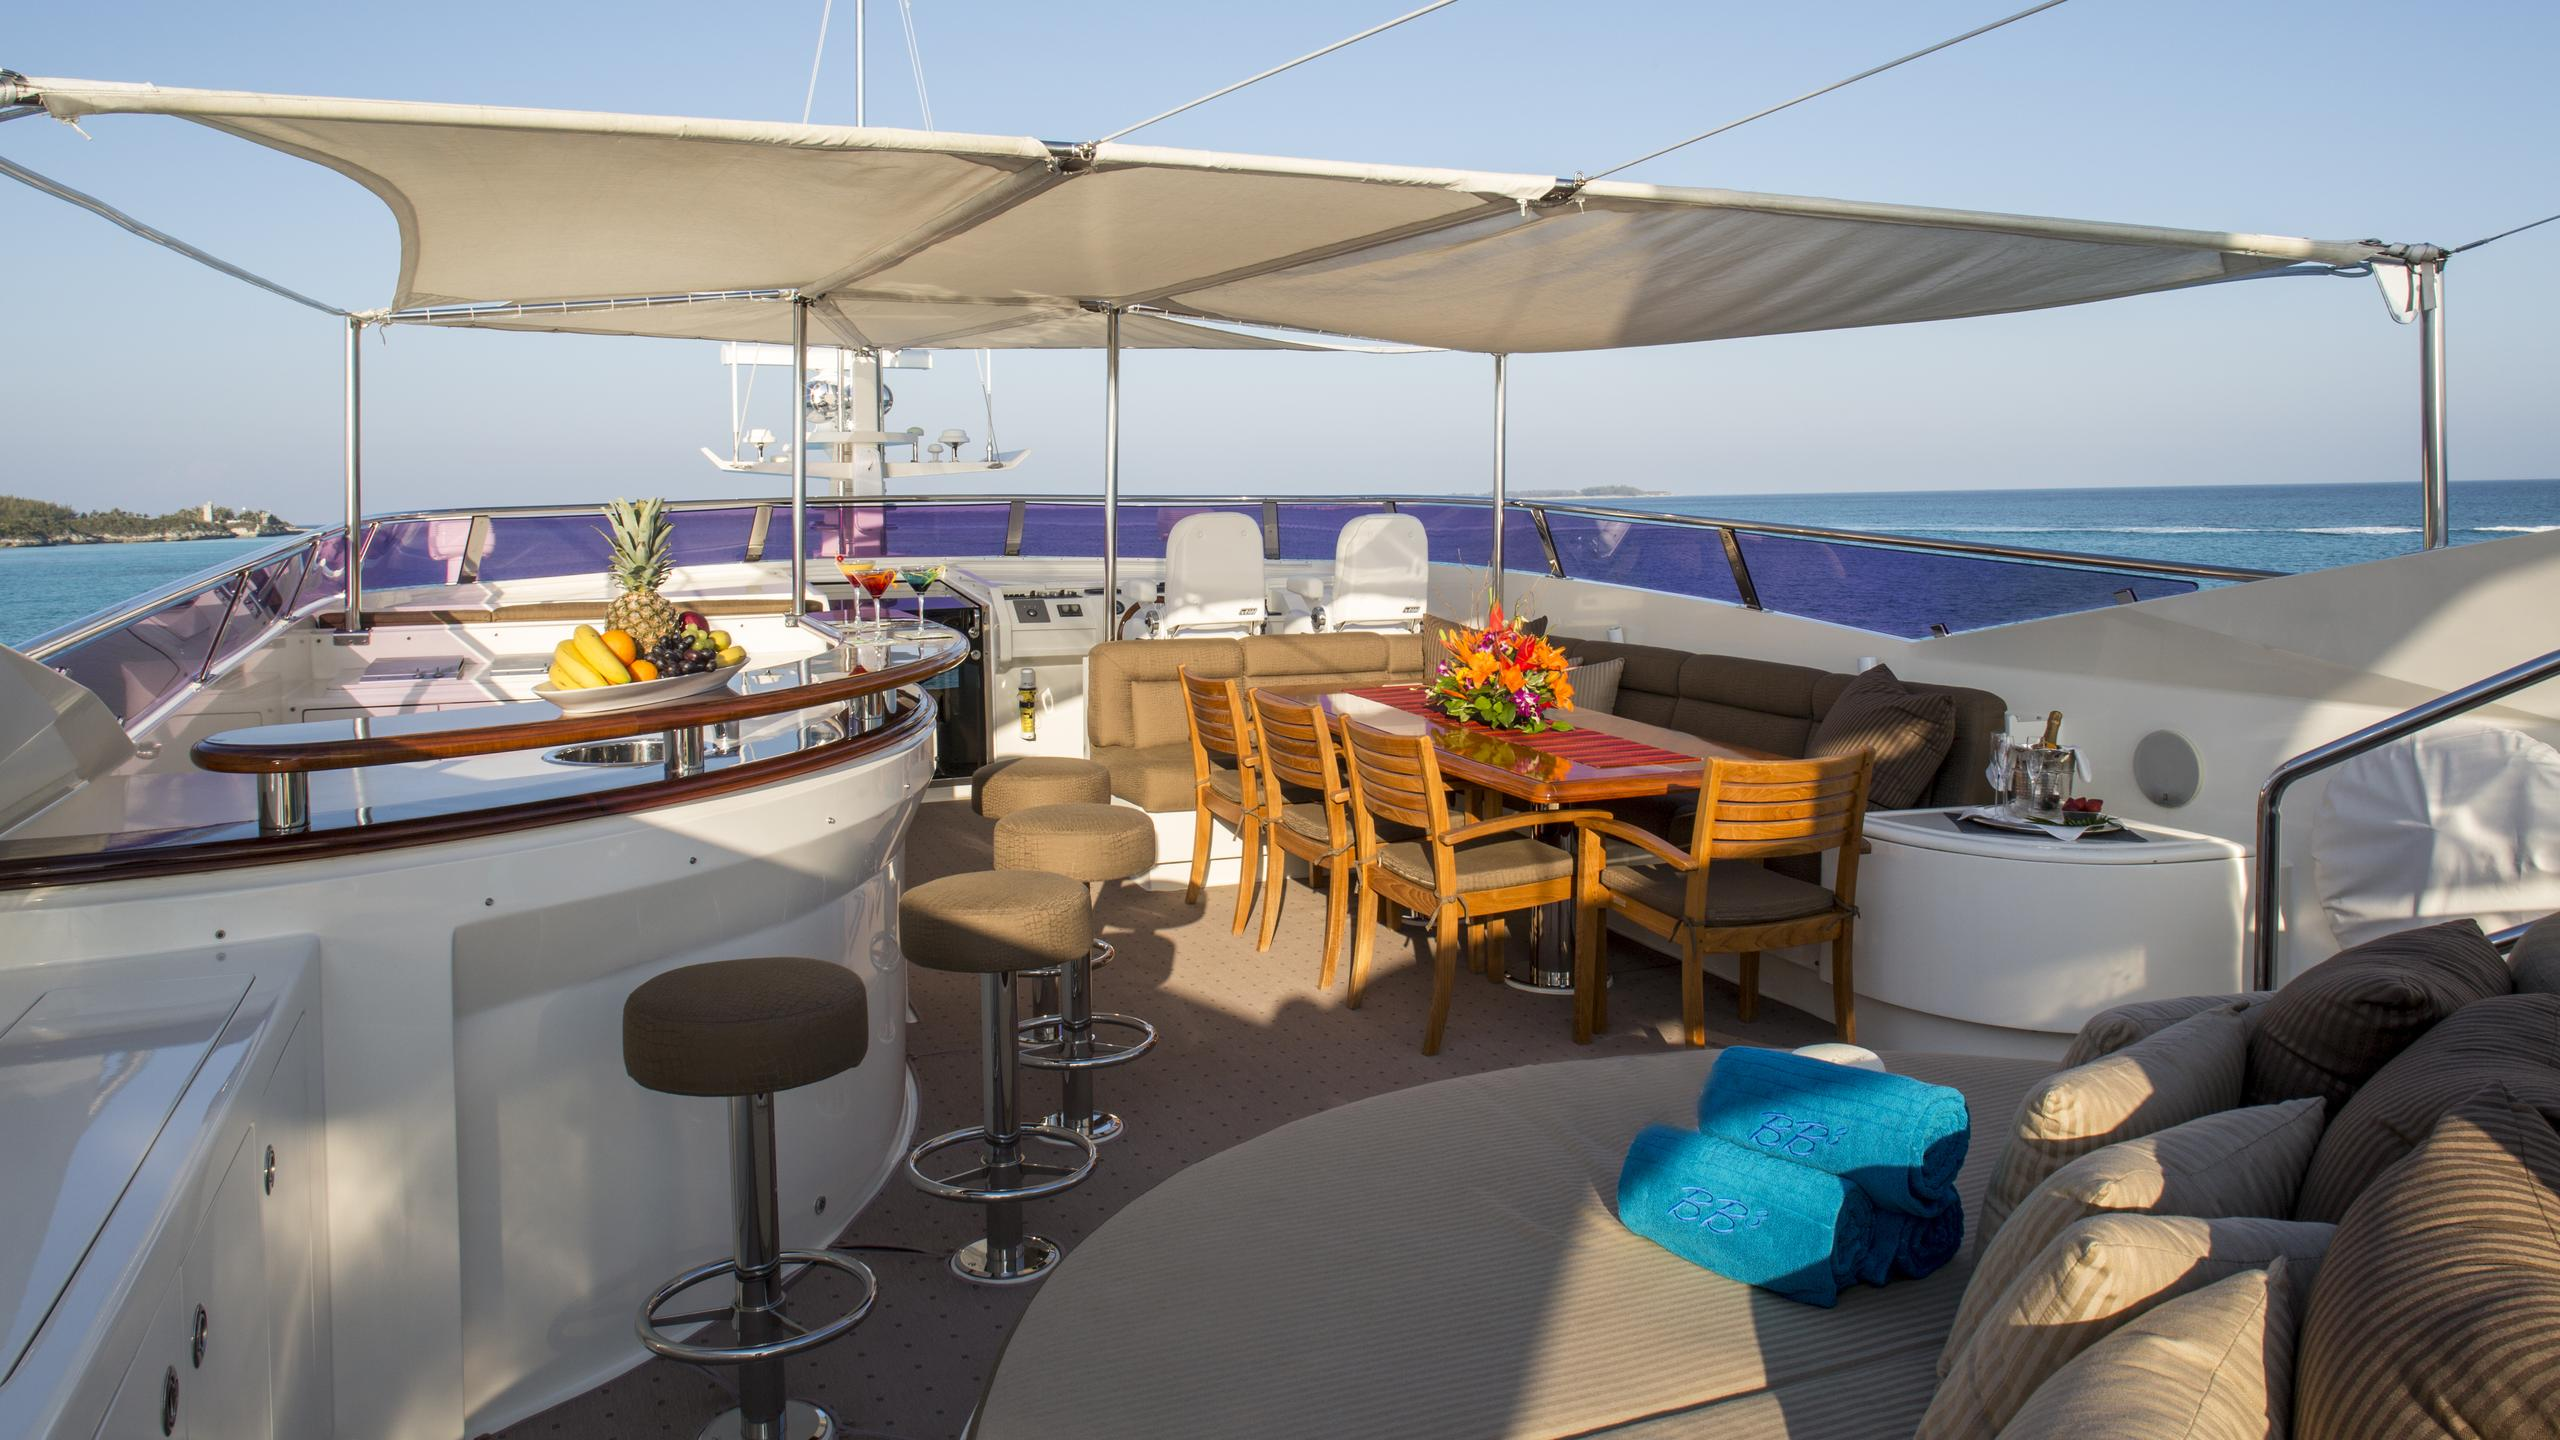 bb3-yacht-fly-deck